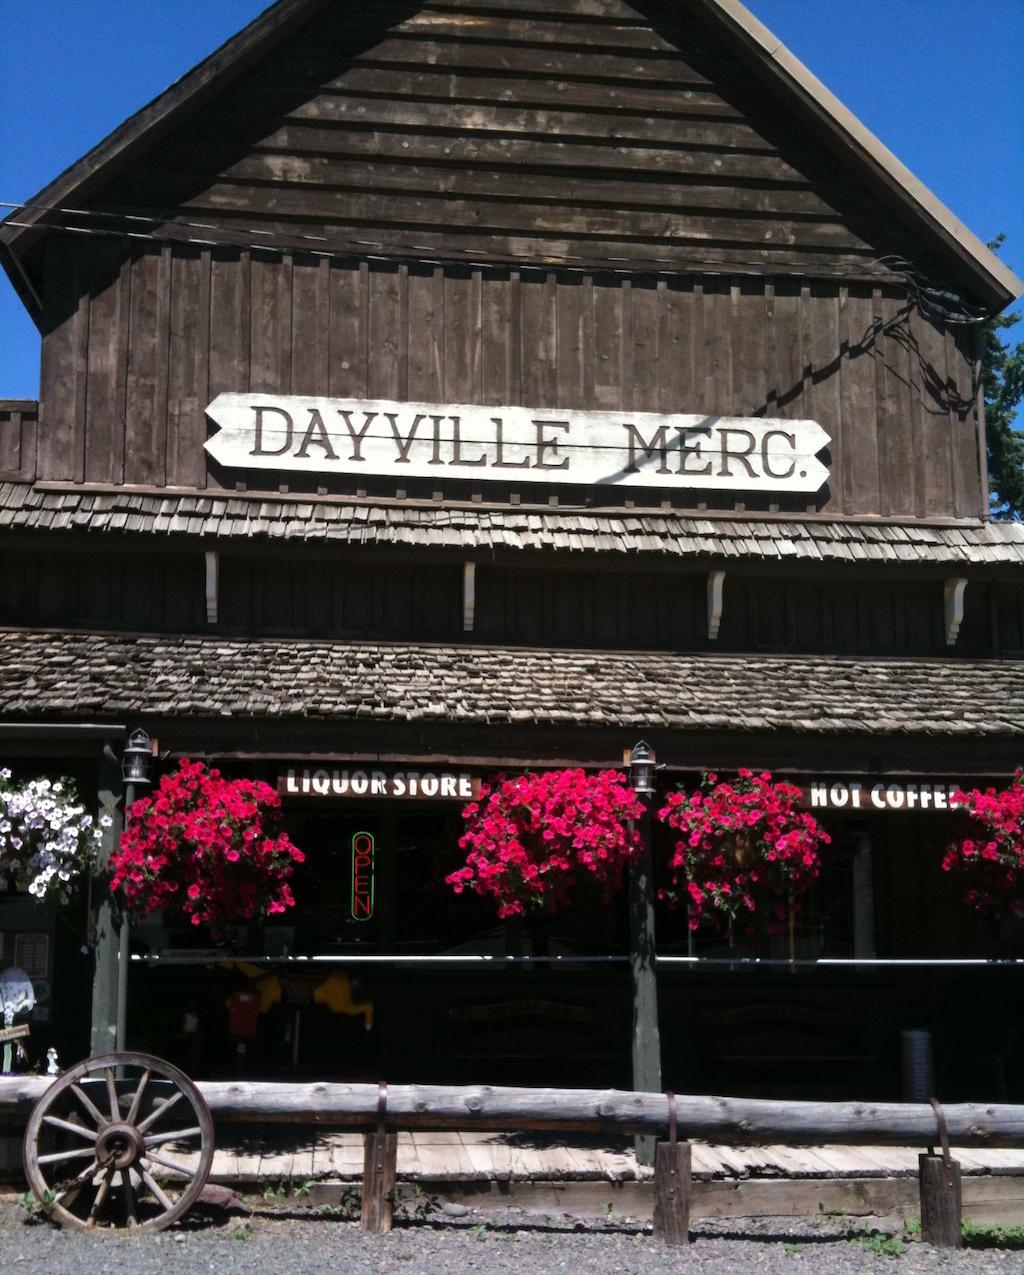 Dayville Mercentile